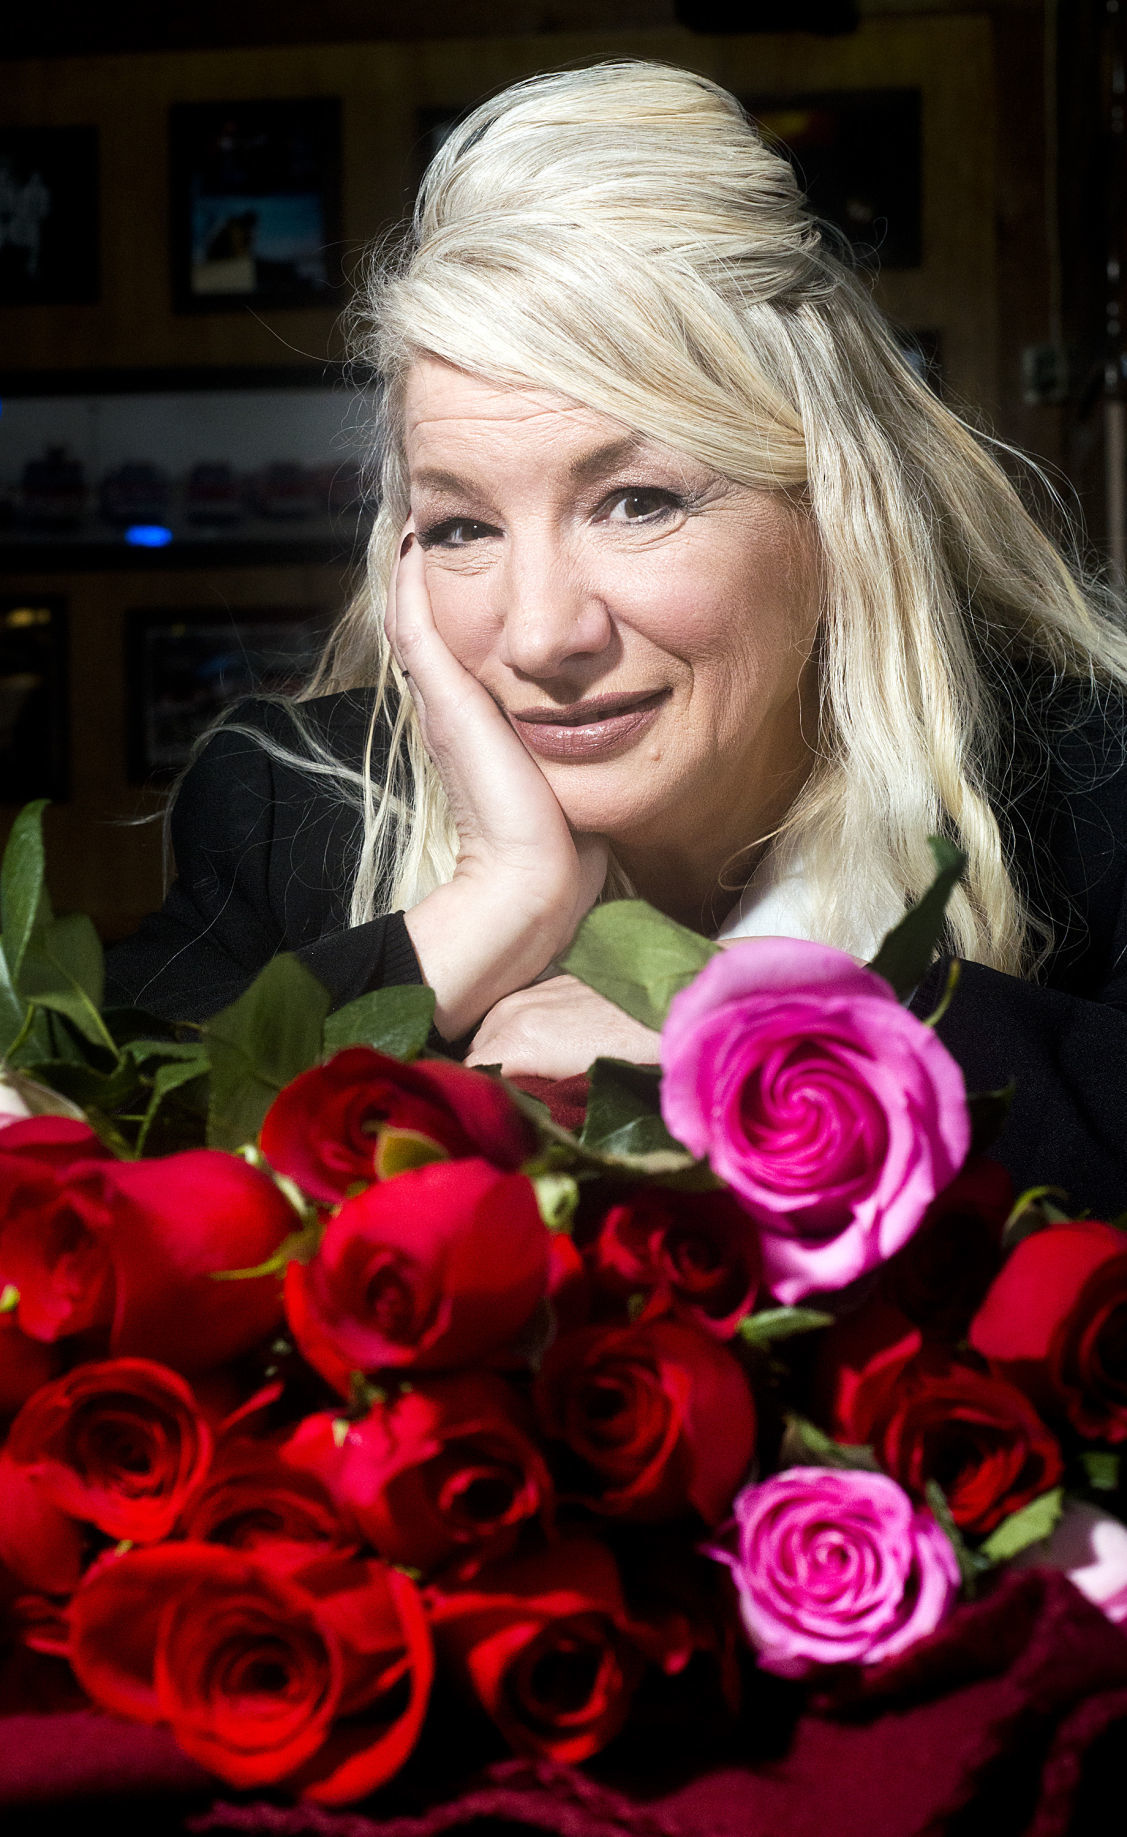 Rose Pam Gregersen-Long